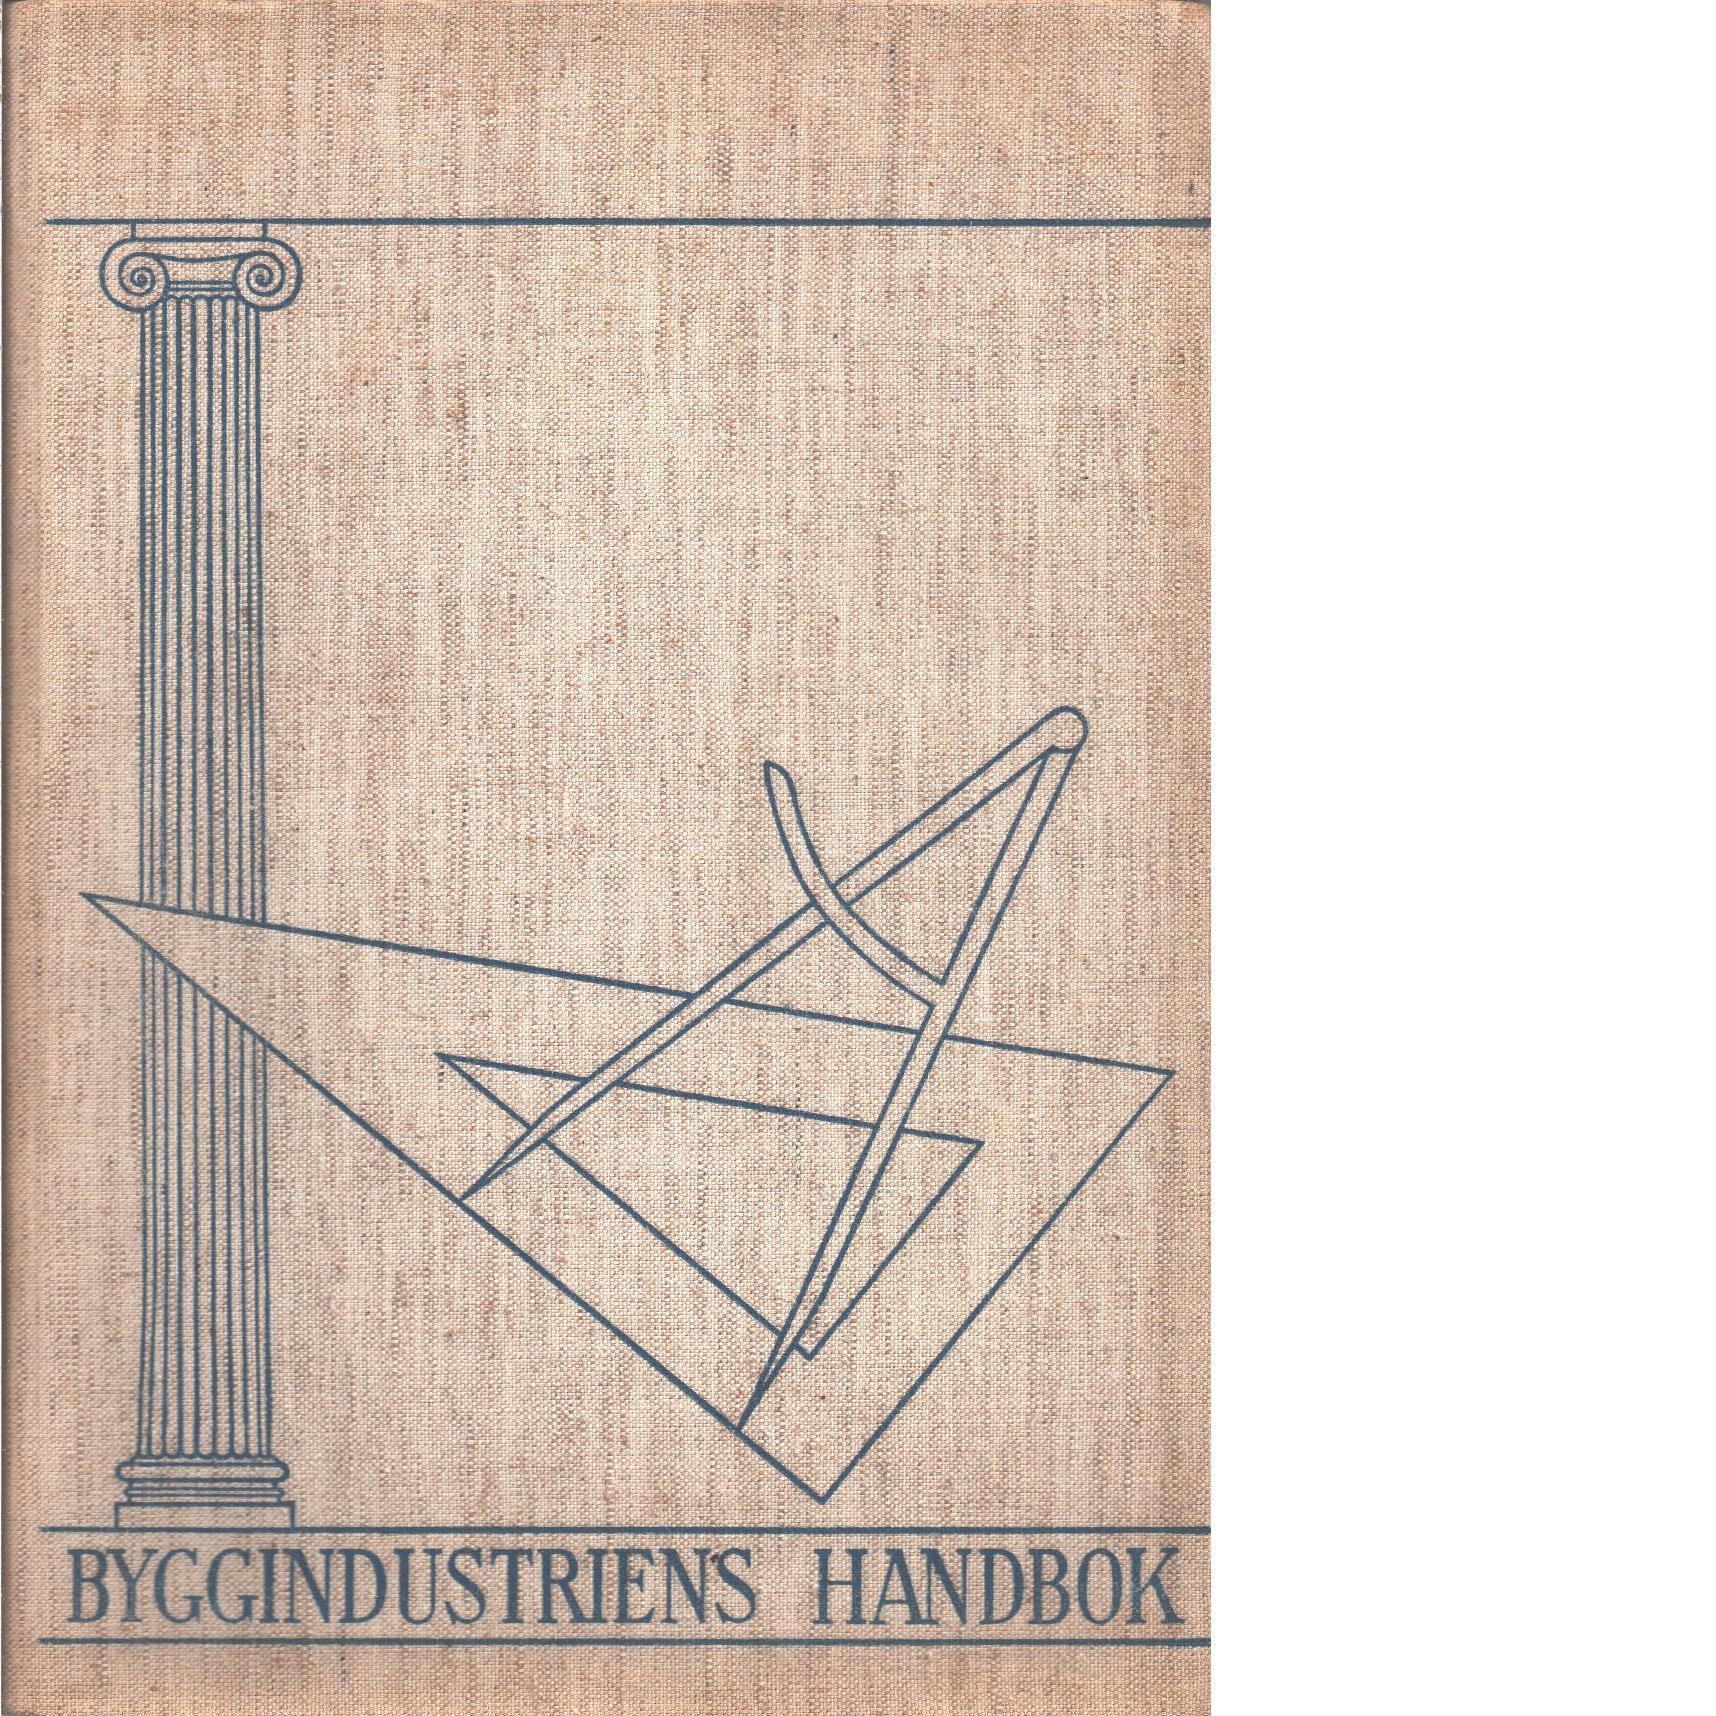 Byggindustriens handbok. - Red.